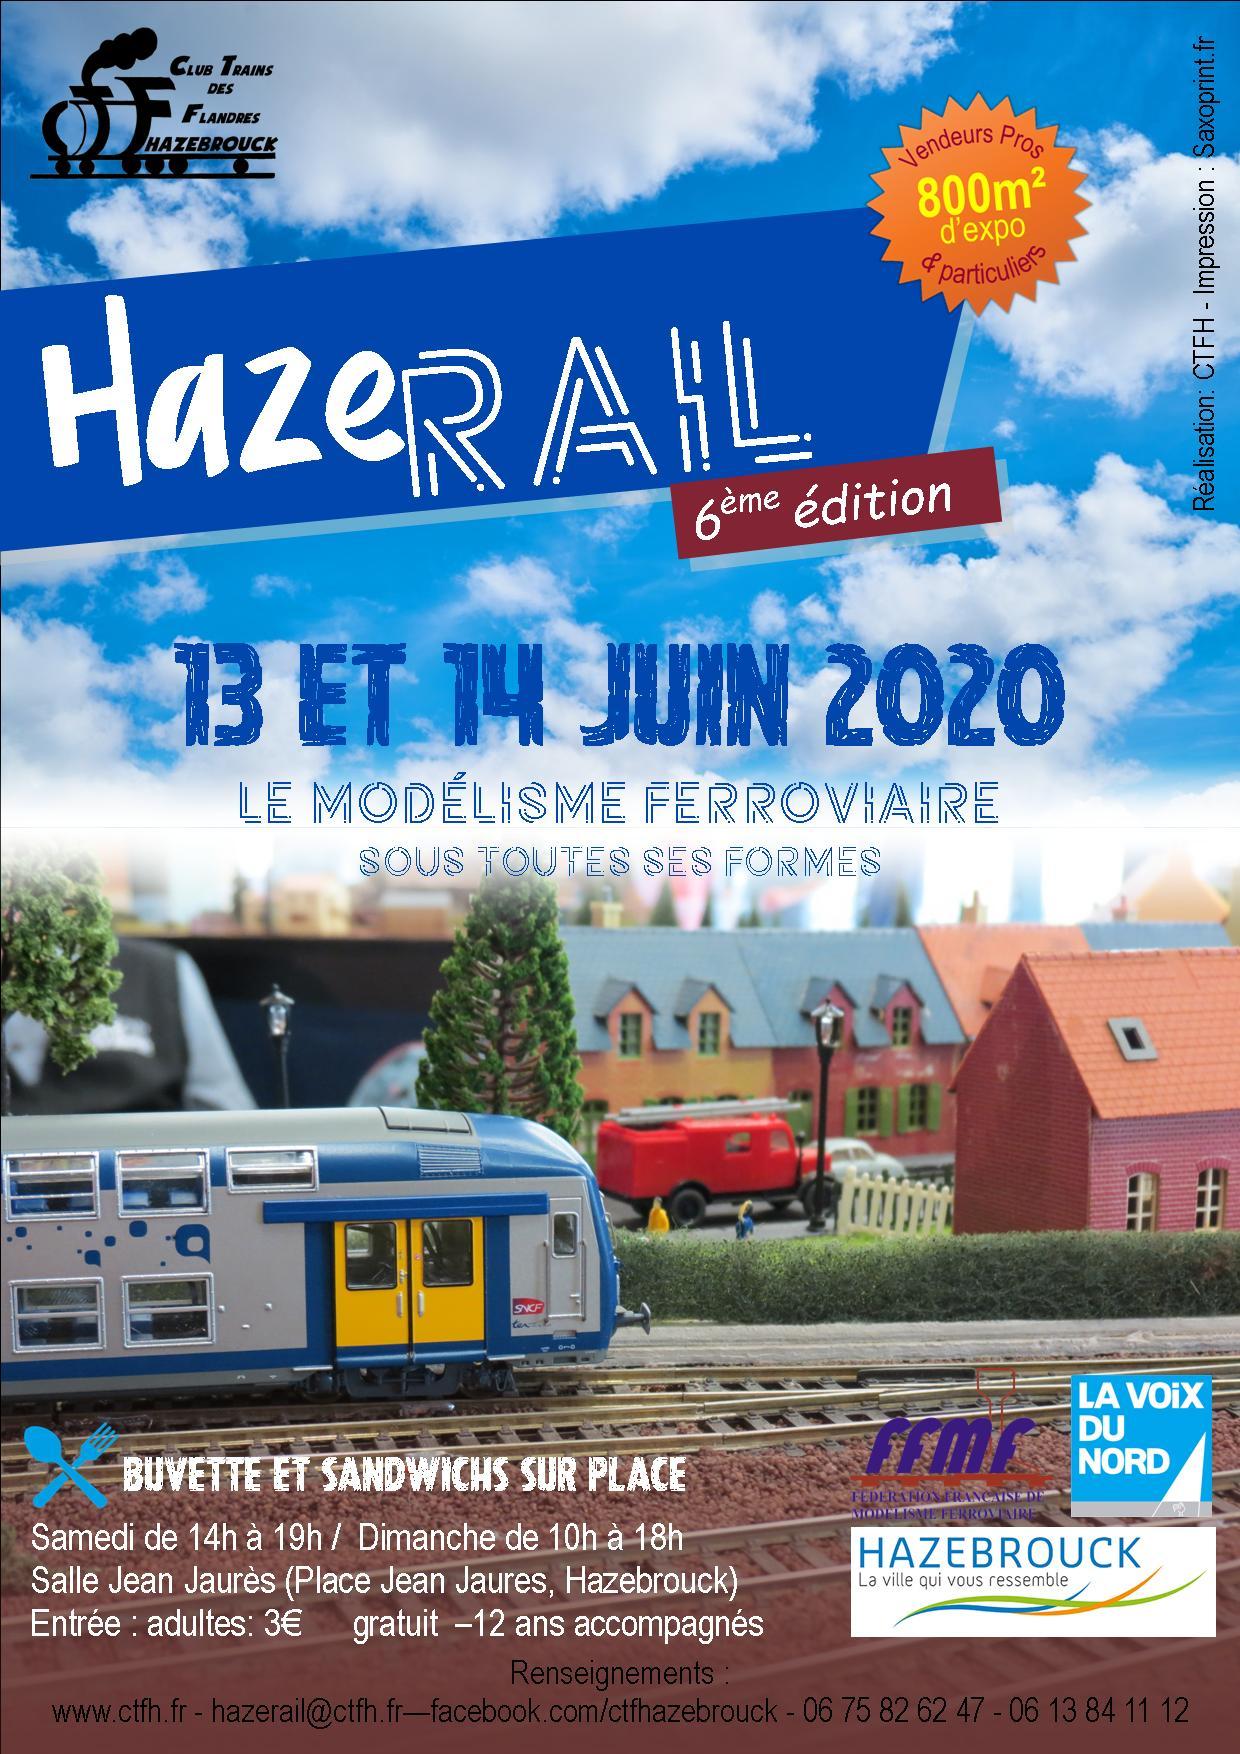 HAZERAIL 2020